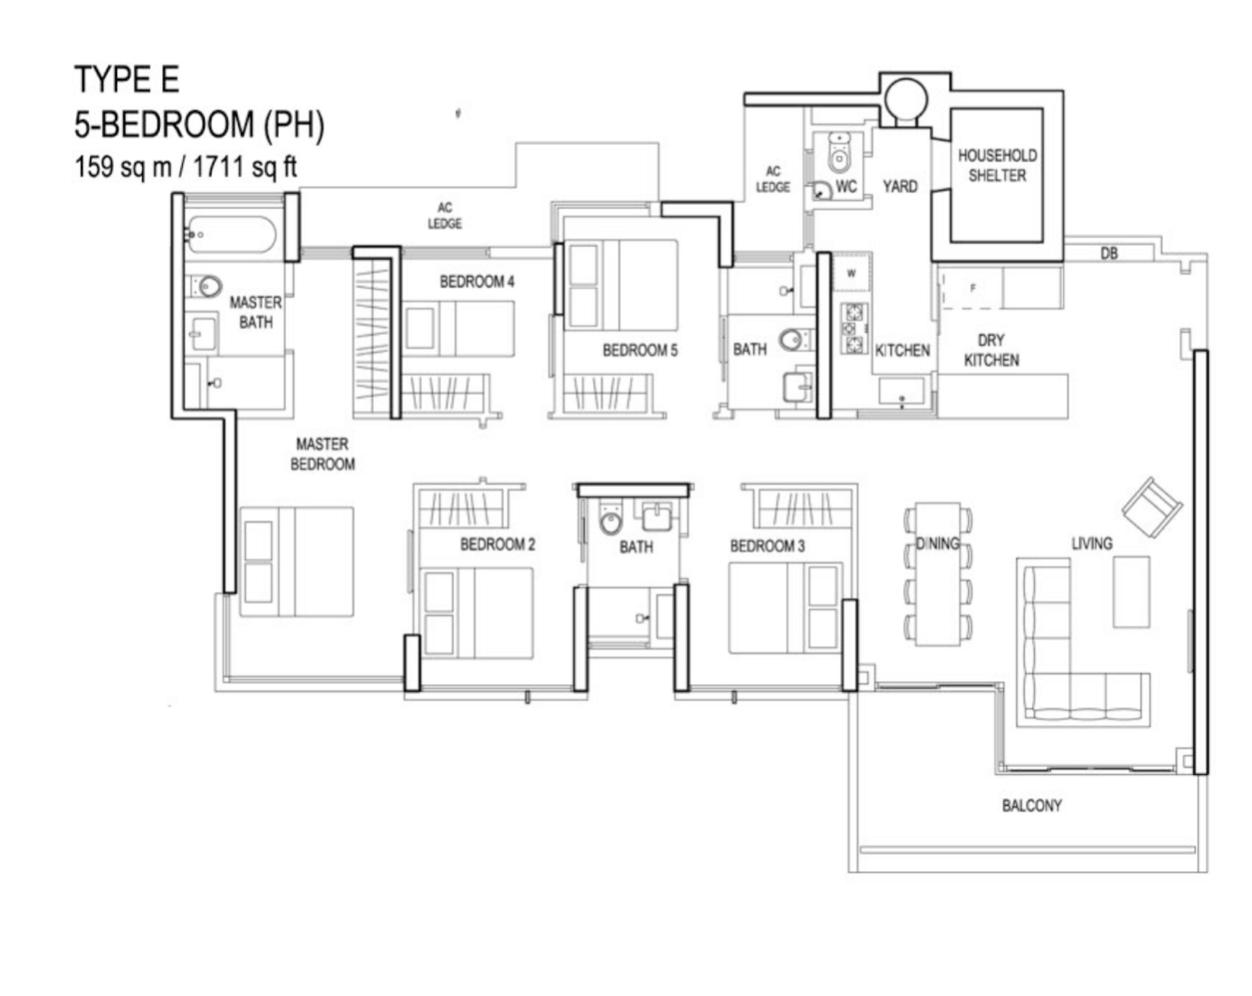 The Terrace - Floor Plan - Type E 5-Bedroom Penthouse 1711sqft